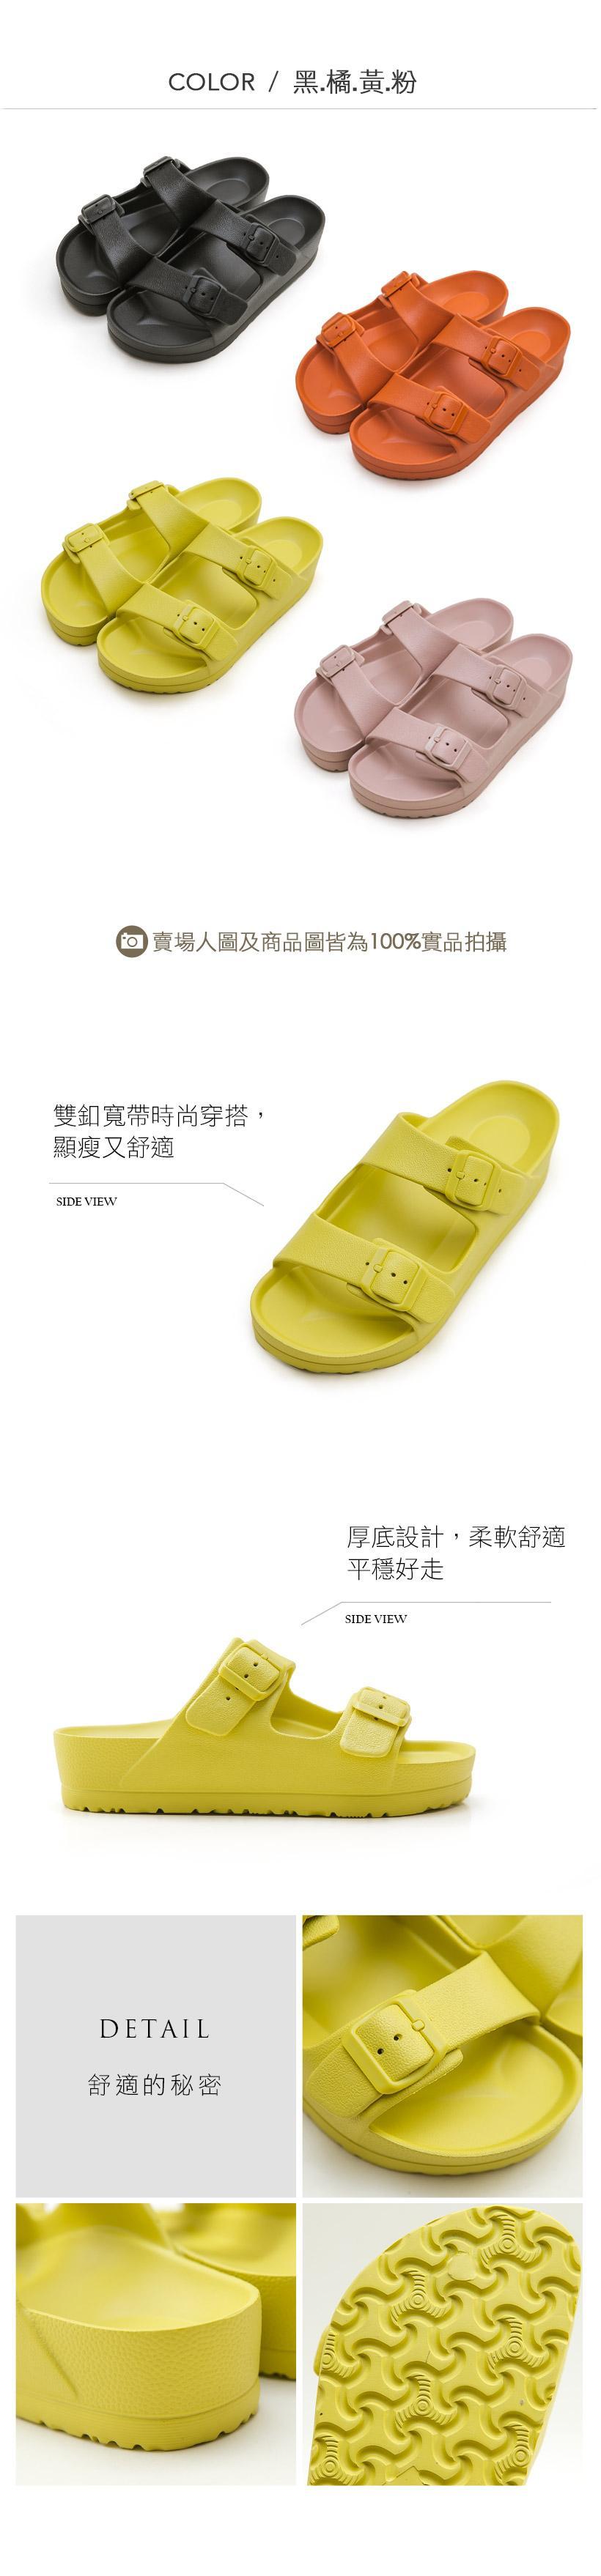 MIT雙釦厚底休閒拖鞋